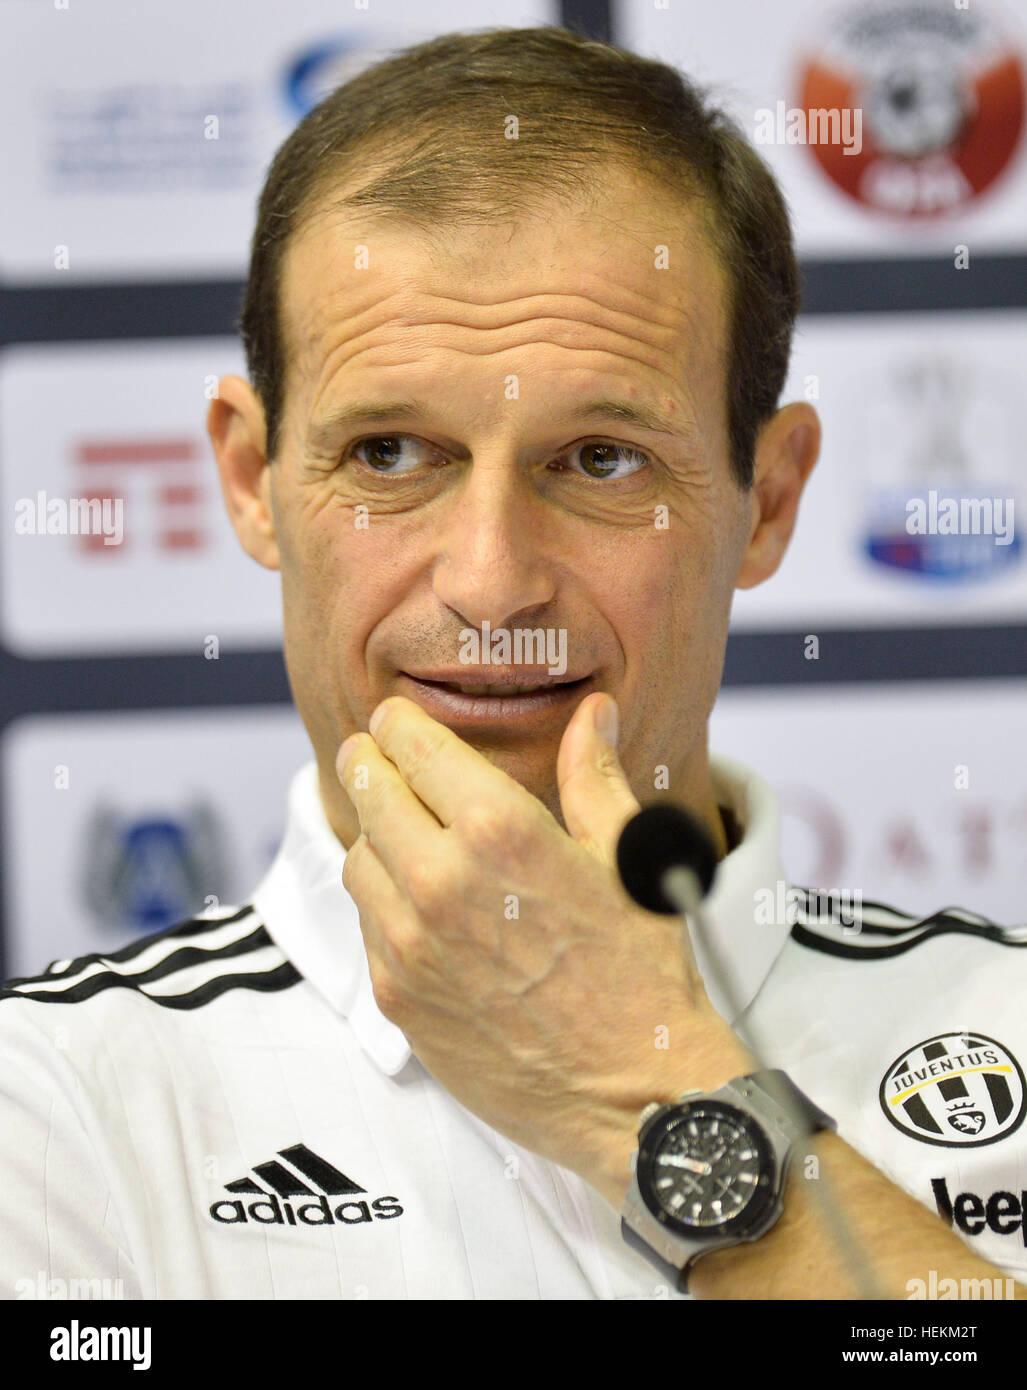 (161223) -- DOHA, le 23 décembre 2016, (Xinhua) -- la Juventus de' l'entraîneur-chef italien Massimiliano Photo Stock